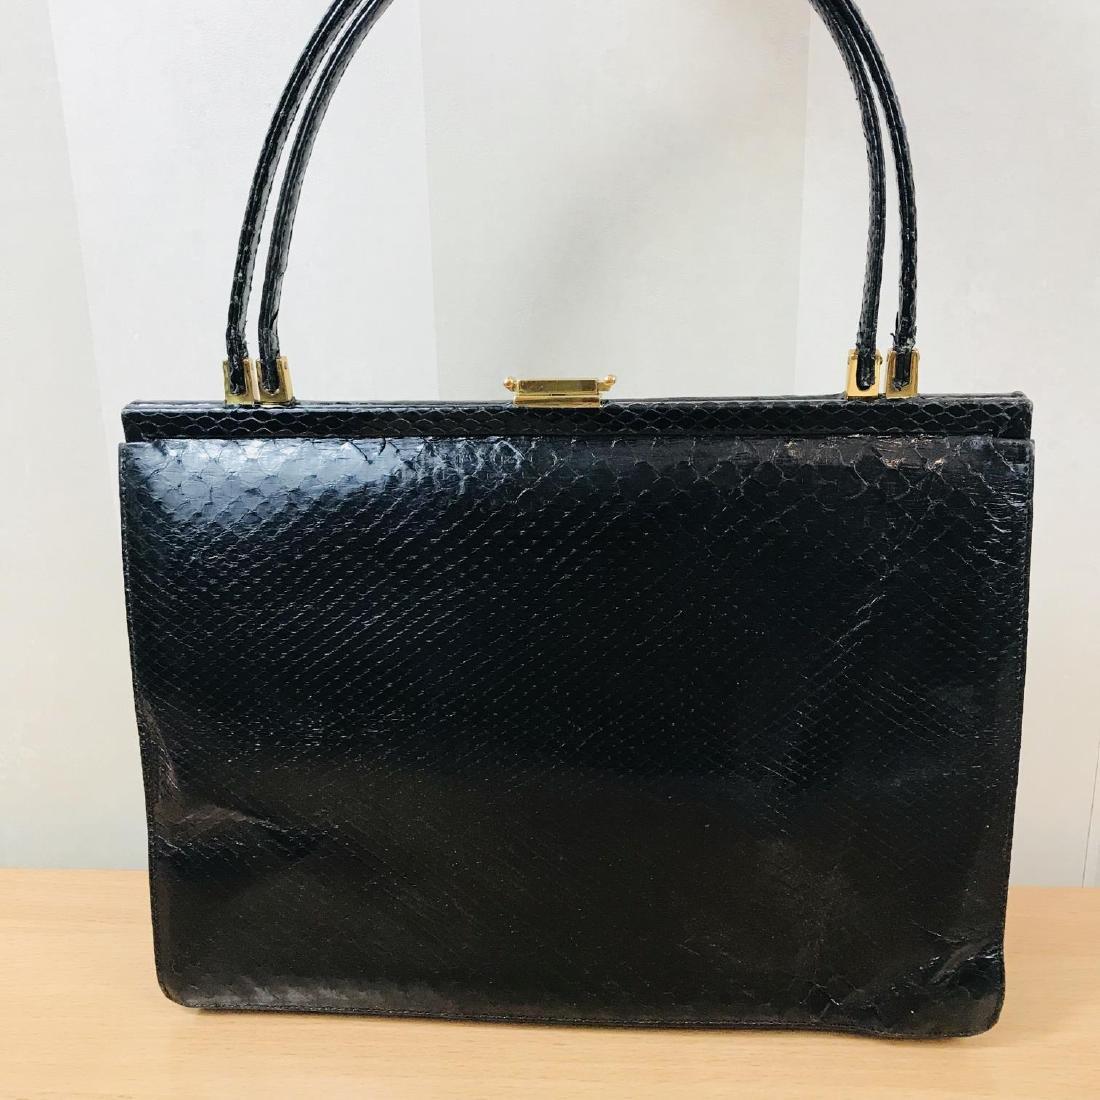 Vintage Black Snakeskin Leather Handbag - 6